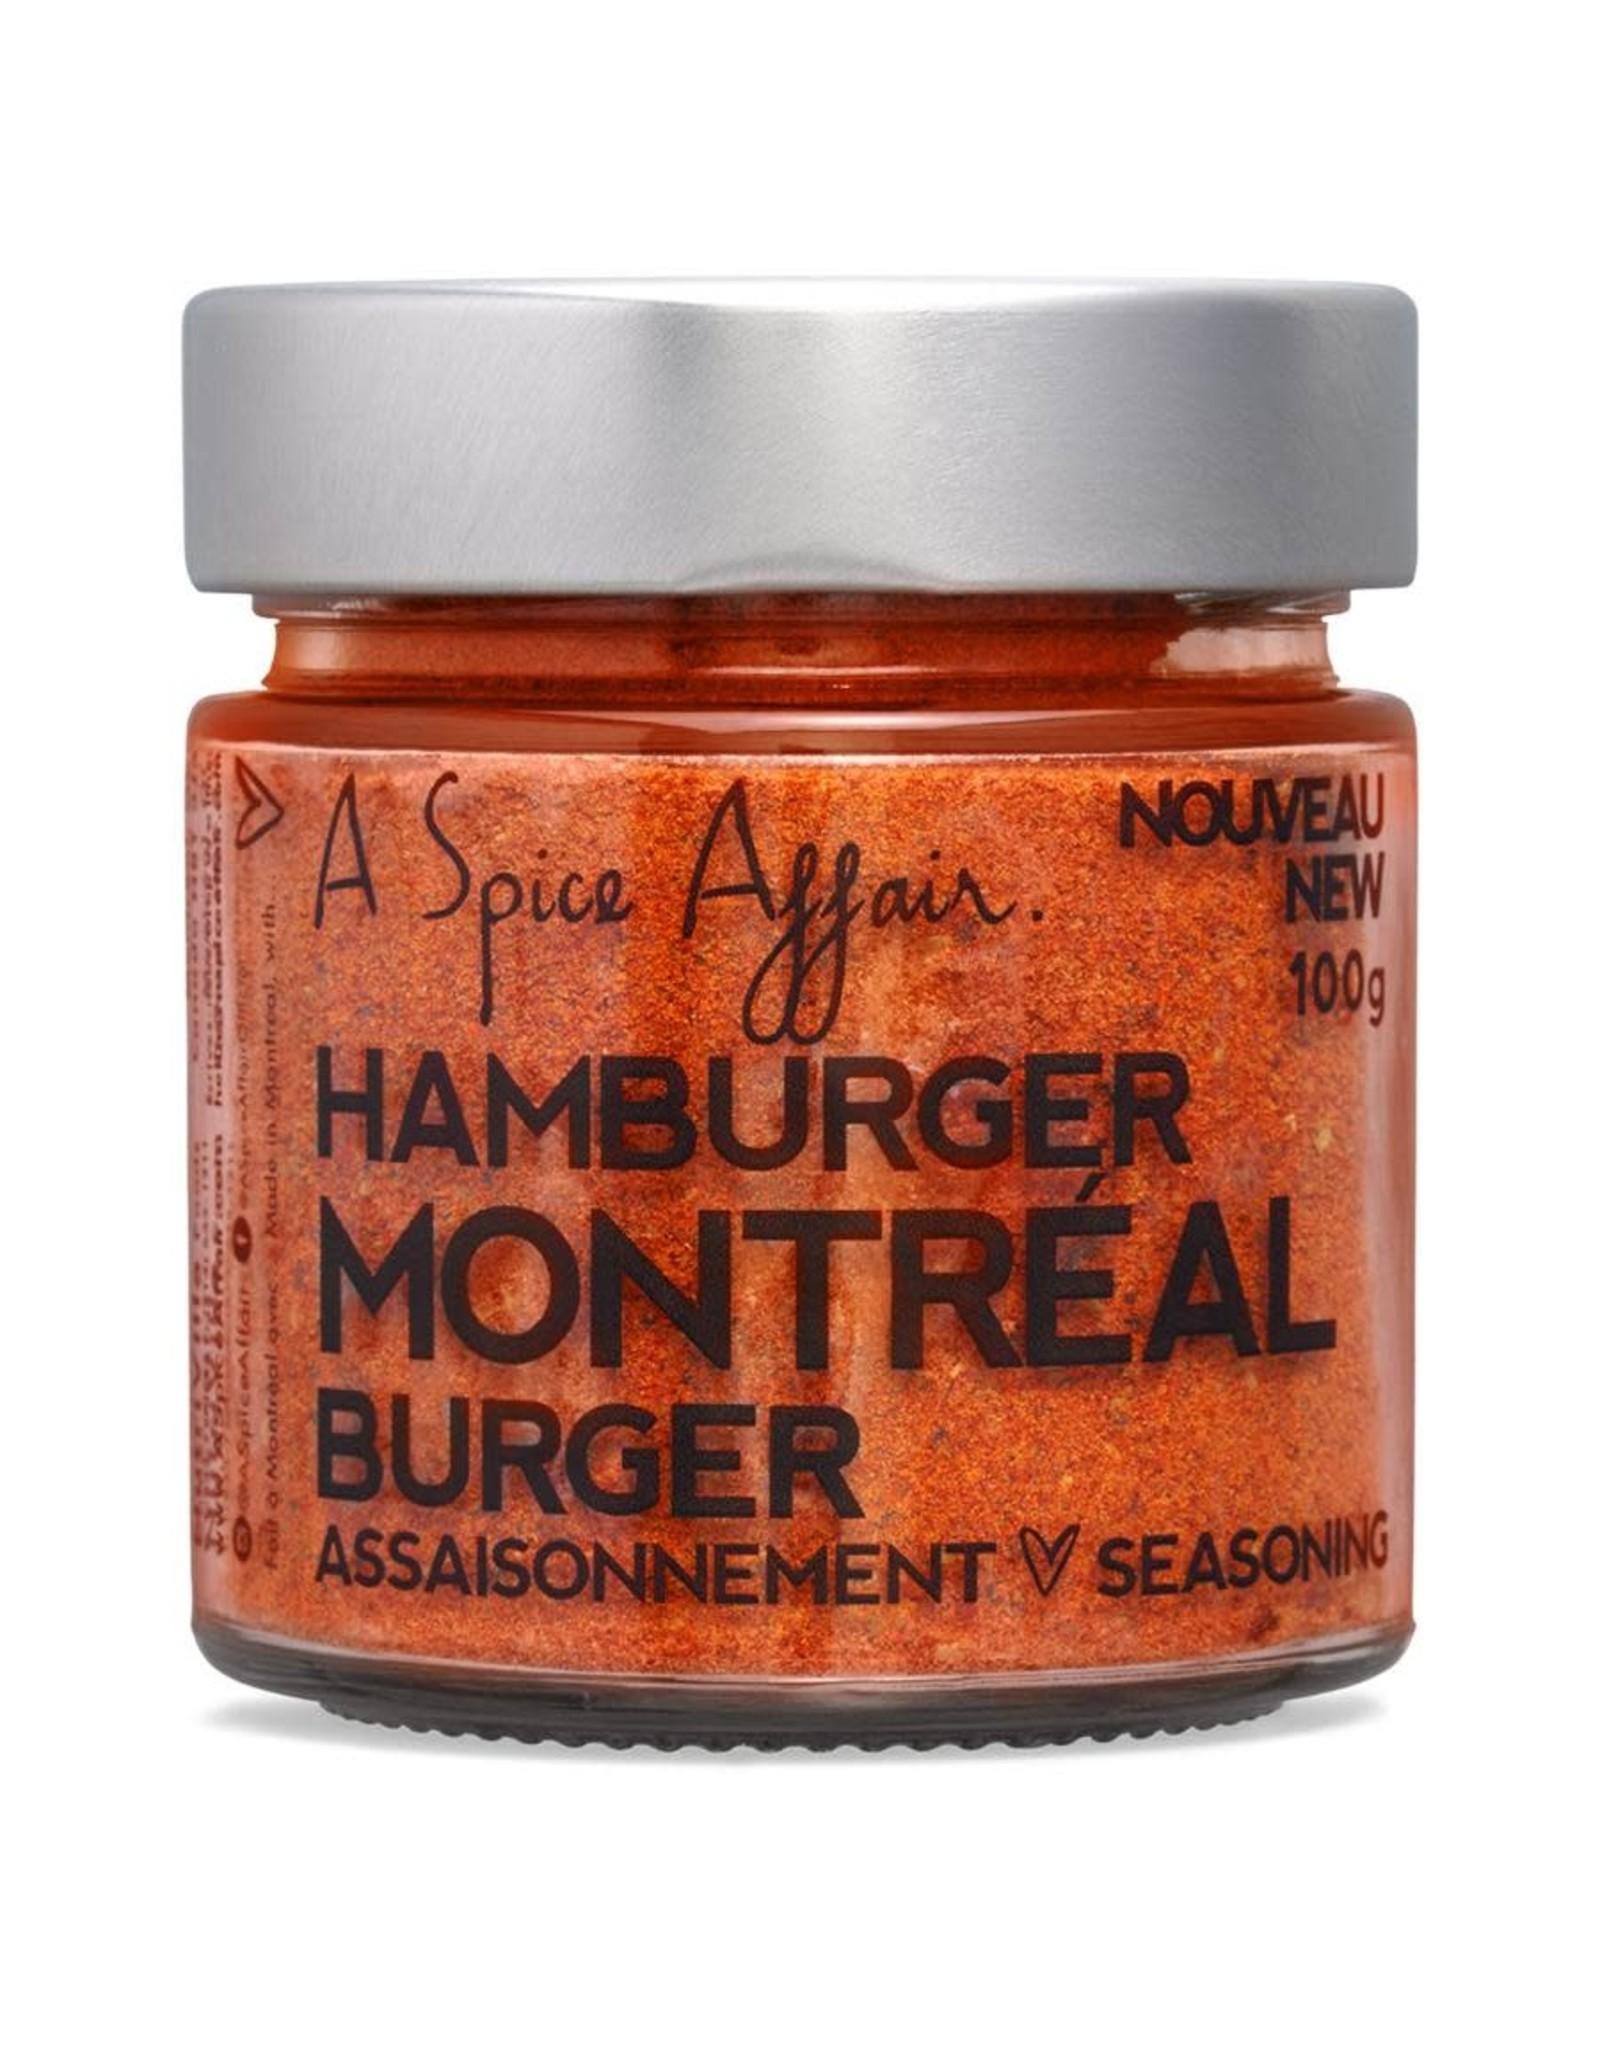 A Spice Affair Burger Montreal Seasoning